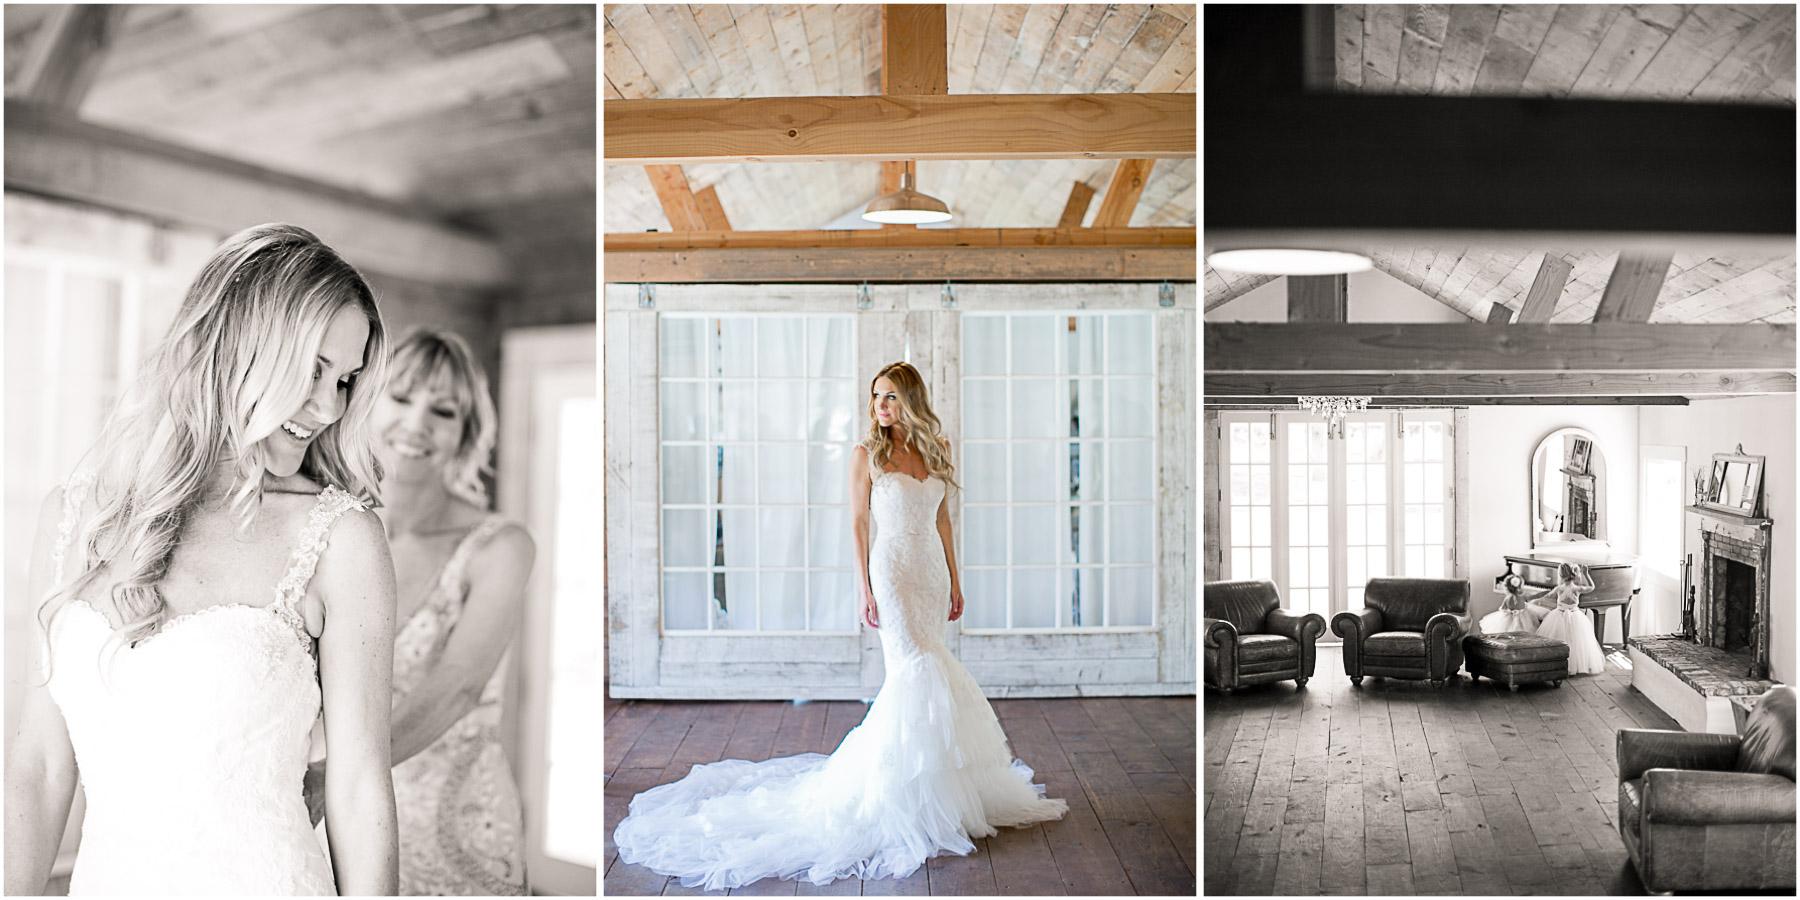 JennaBethPhotography-MEWedding-5.jpg